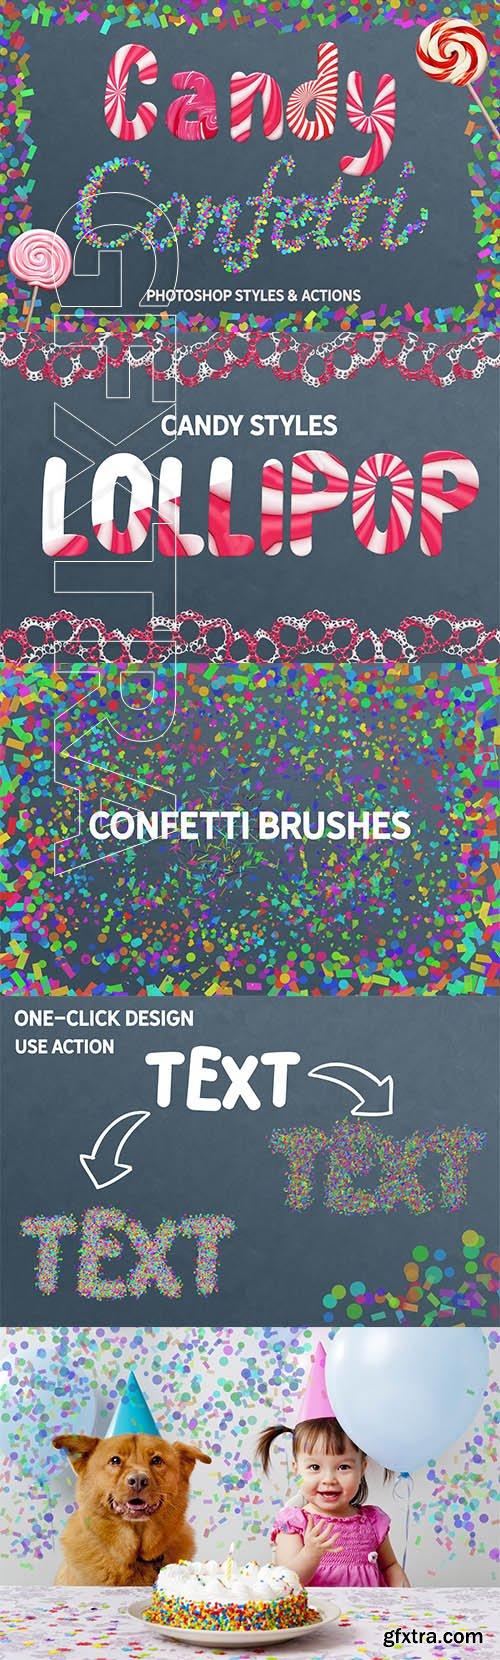 CreativeMarket - CANDY & CONFETTI Styles Photoshop 3698395